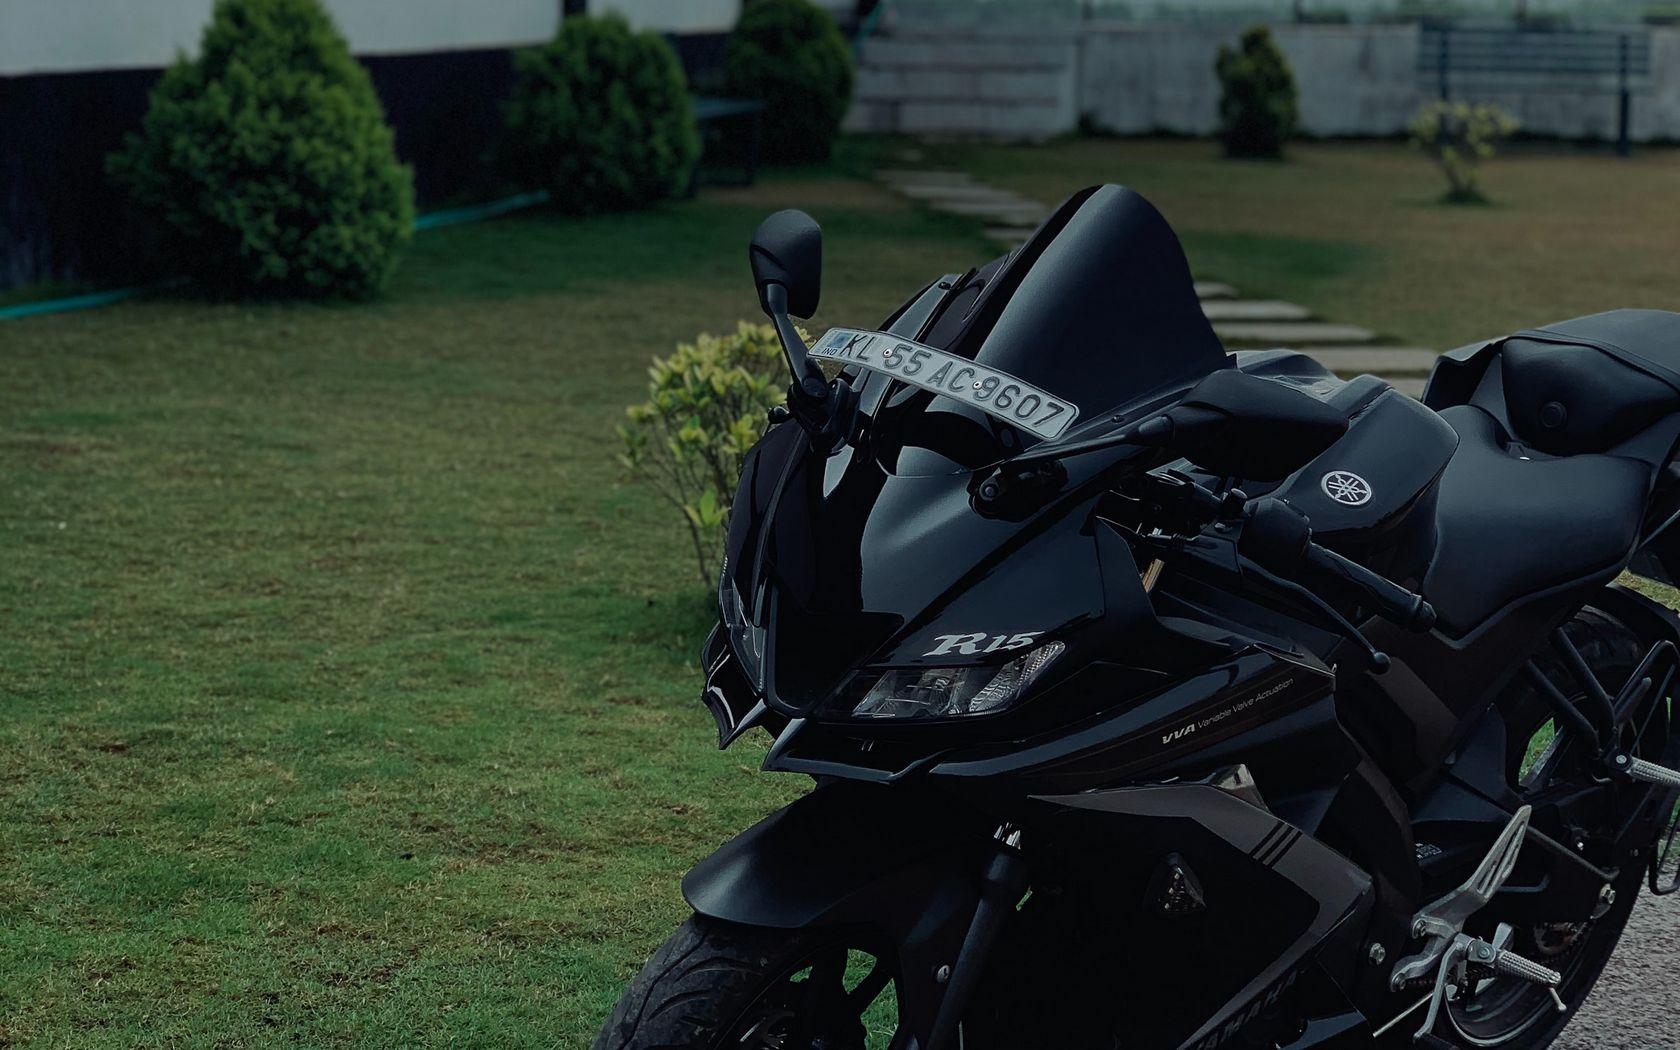 1680x1050 Wallpaper yamaha r15, yamaha, motorcycle, bike, black